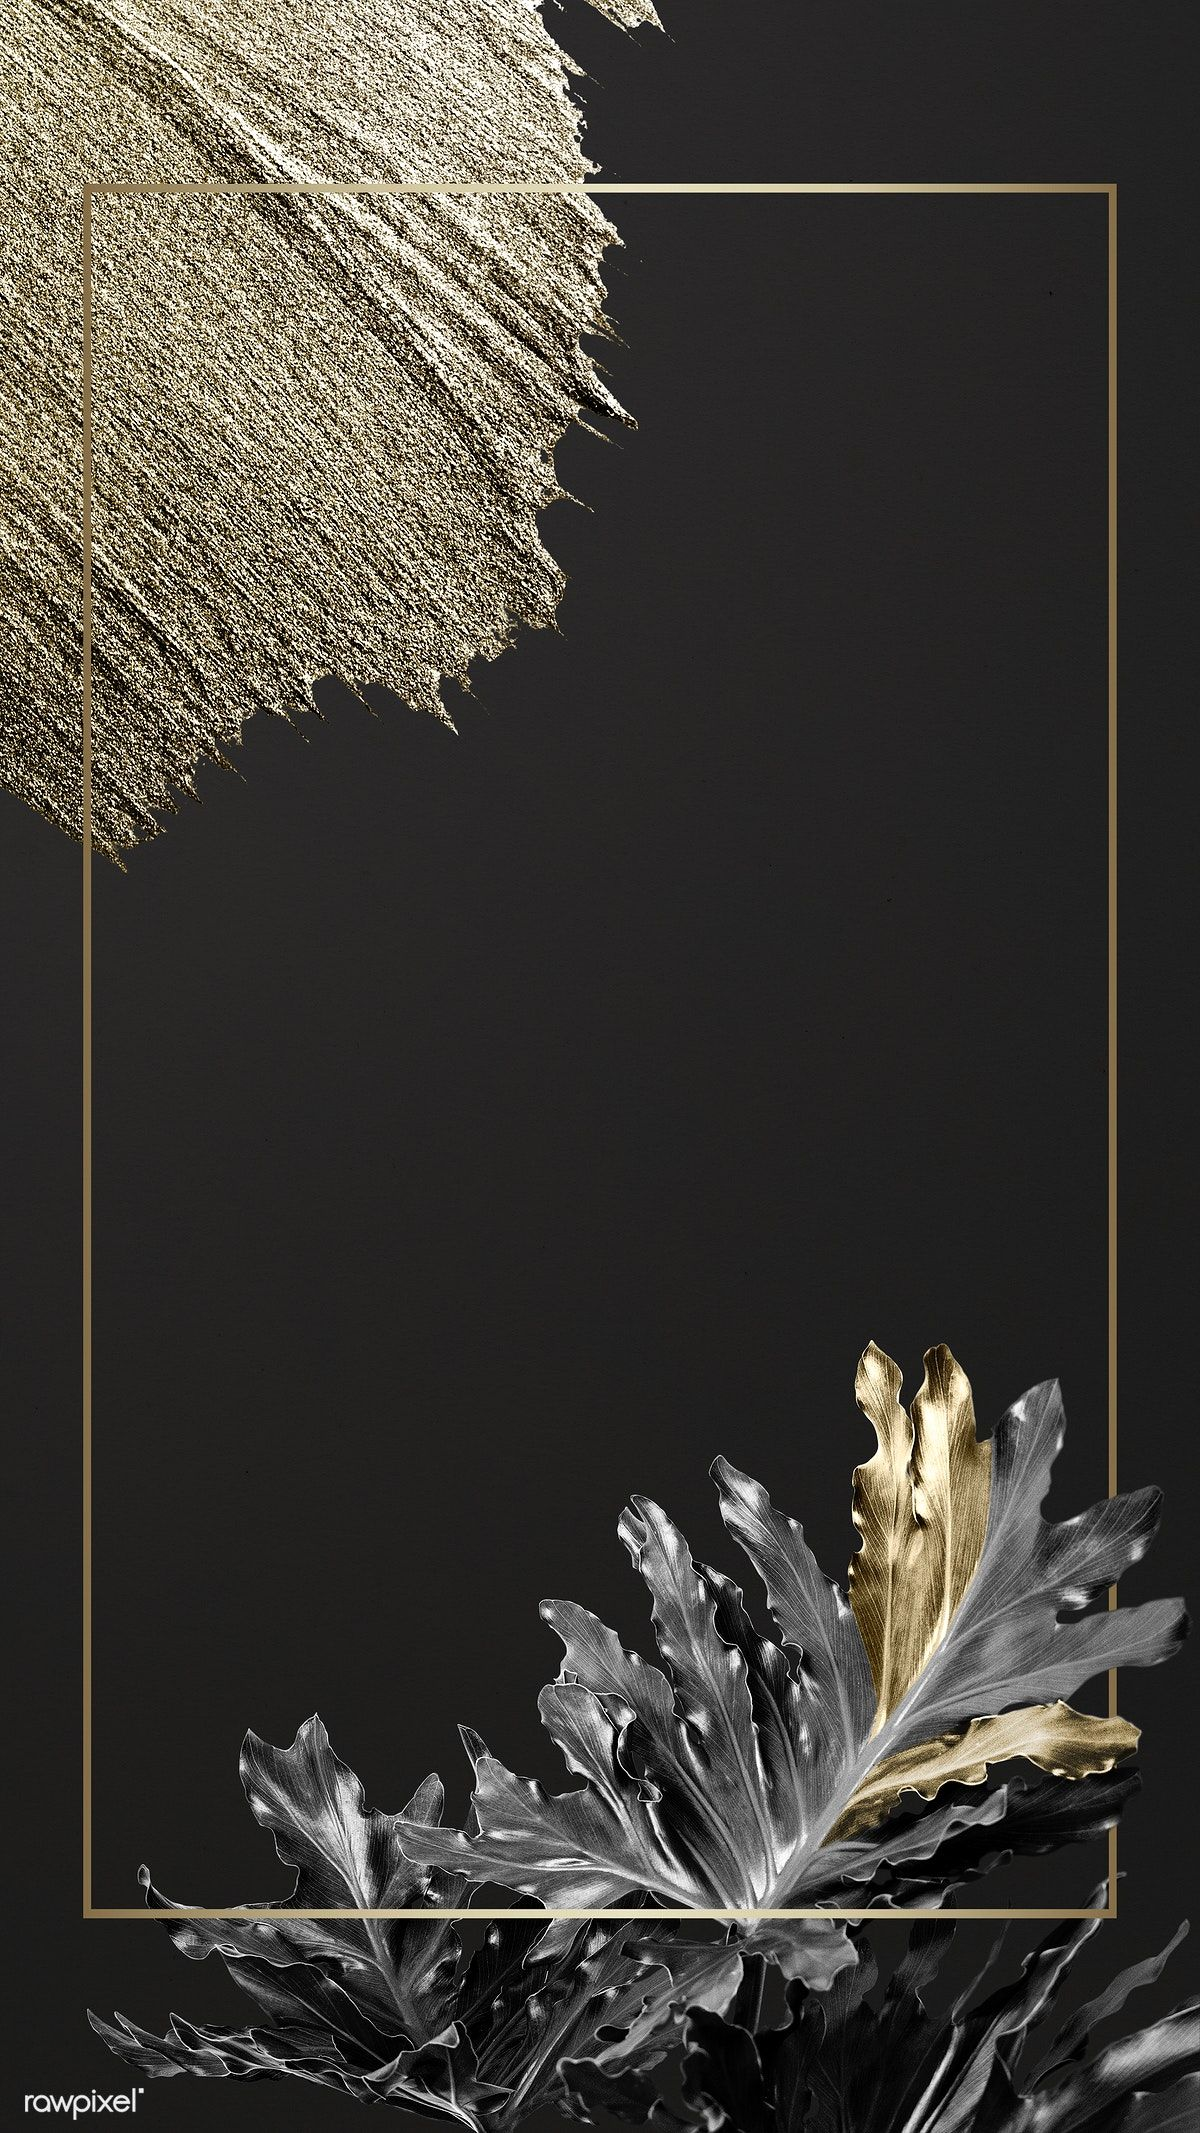 Rectangular golden frame on a nature background | premium image by rawpixel.com / Adj / HwangMangjoo